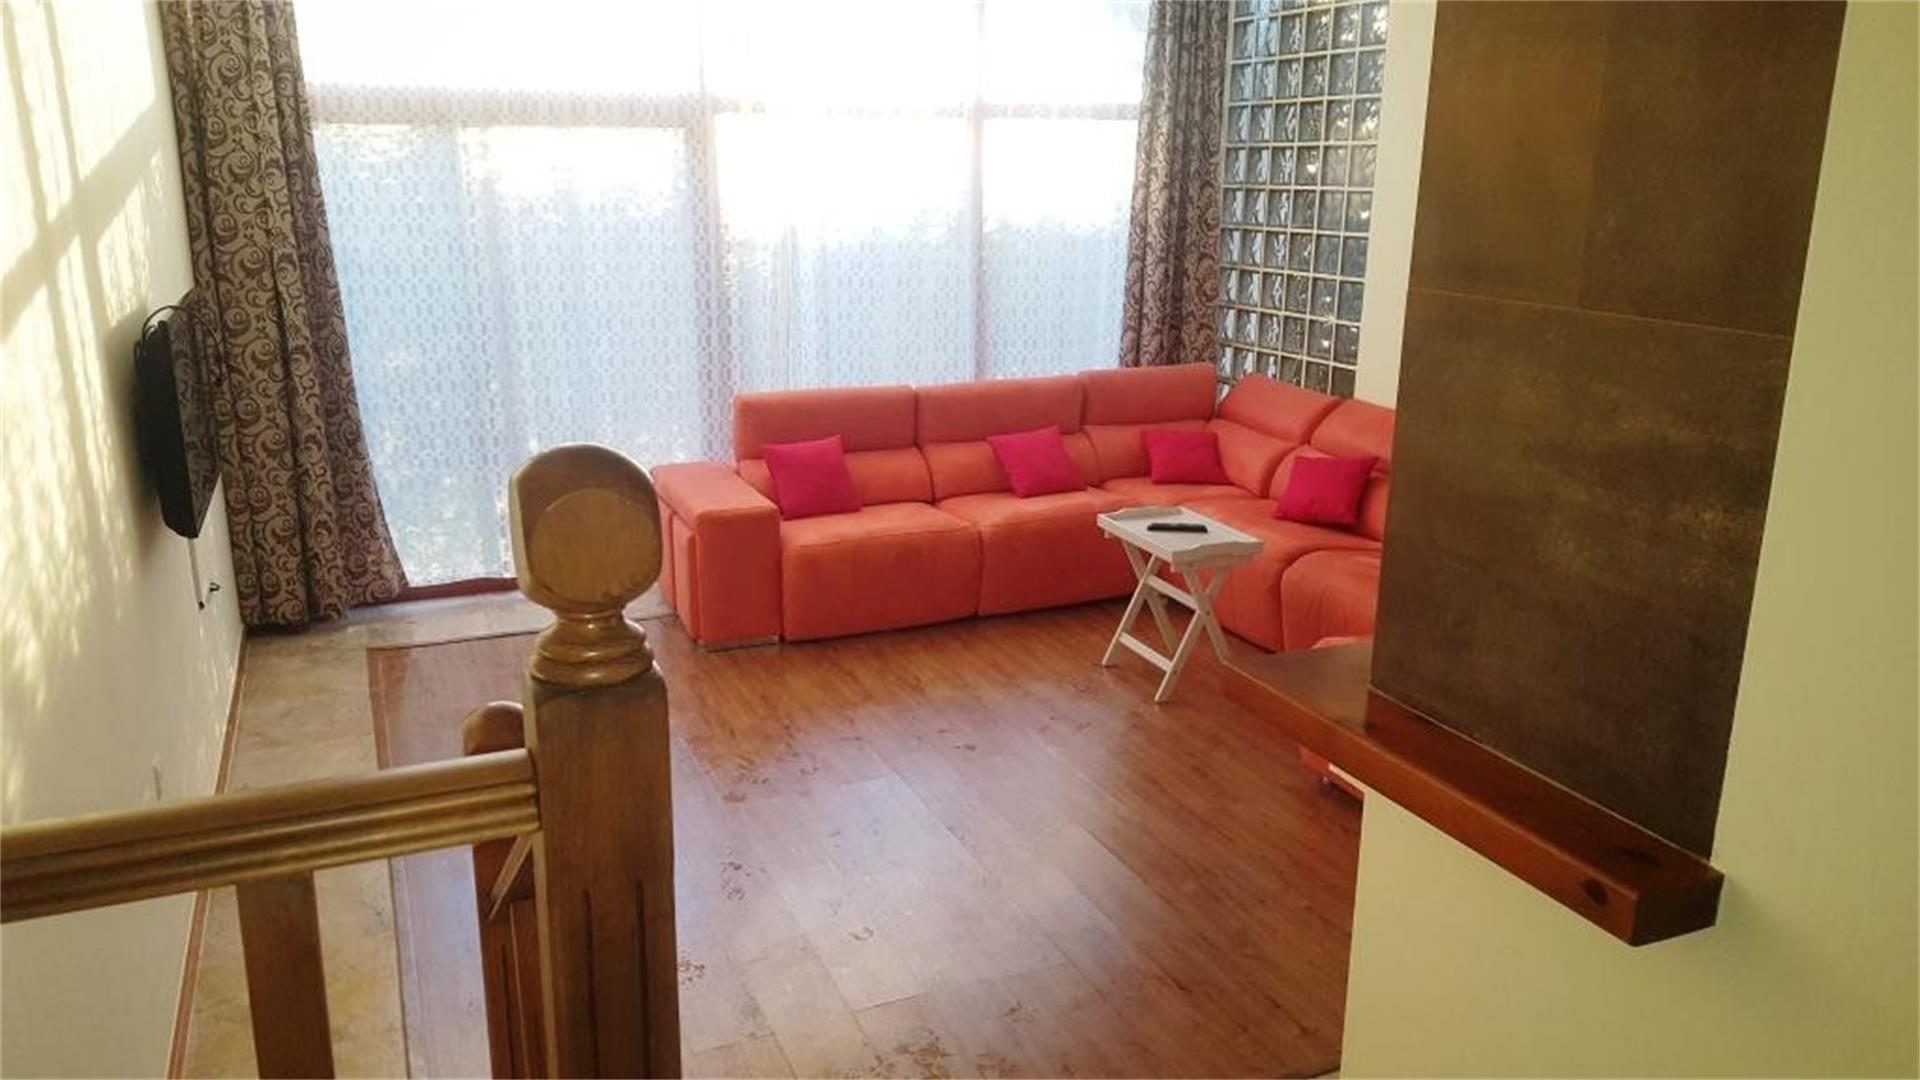 Casa o chalet de alquiler en Calle del Lago, 38 Bel Air - Cancelada - Saladillo (Bel-Air, Málaga)